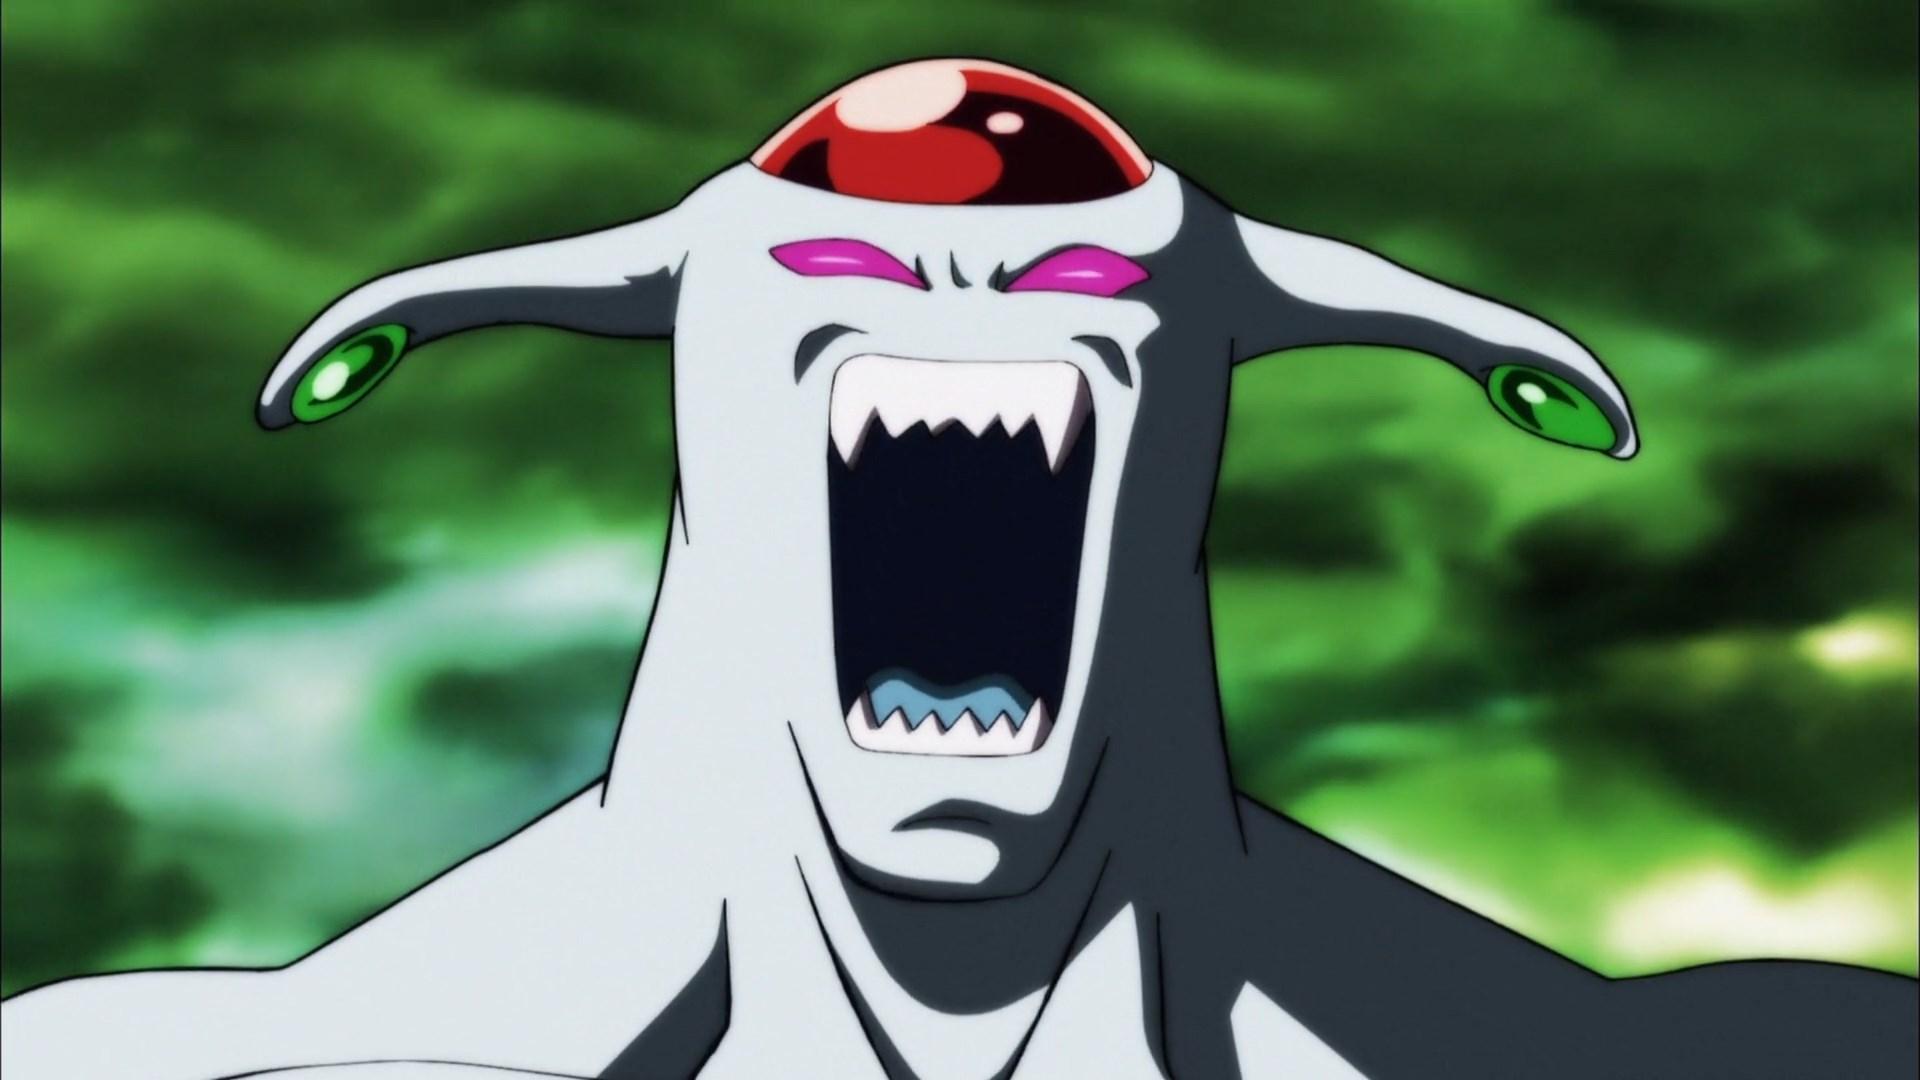 [HorribleSubs] Dragon Ball Super - 121 [1080p].mkv_snapshot_13.04